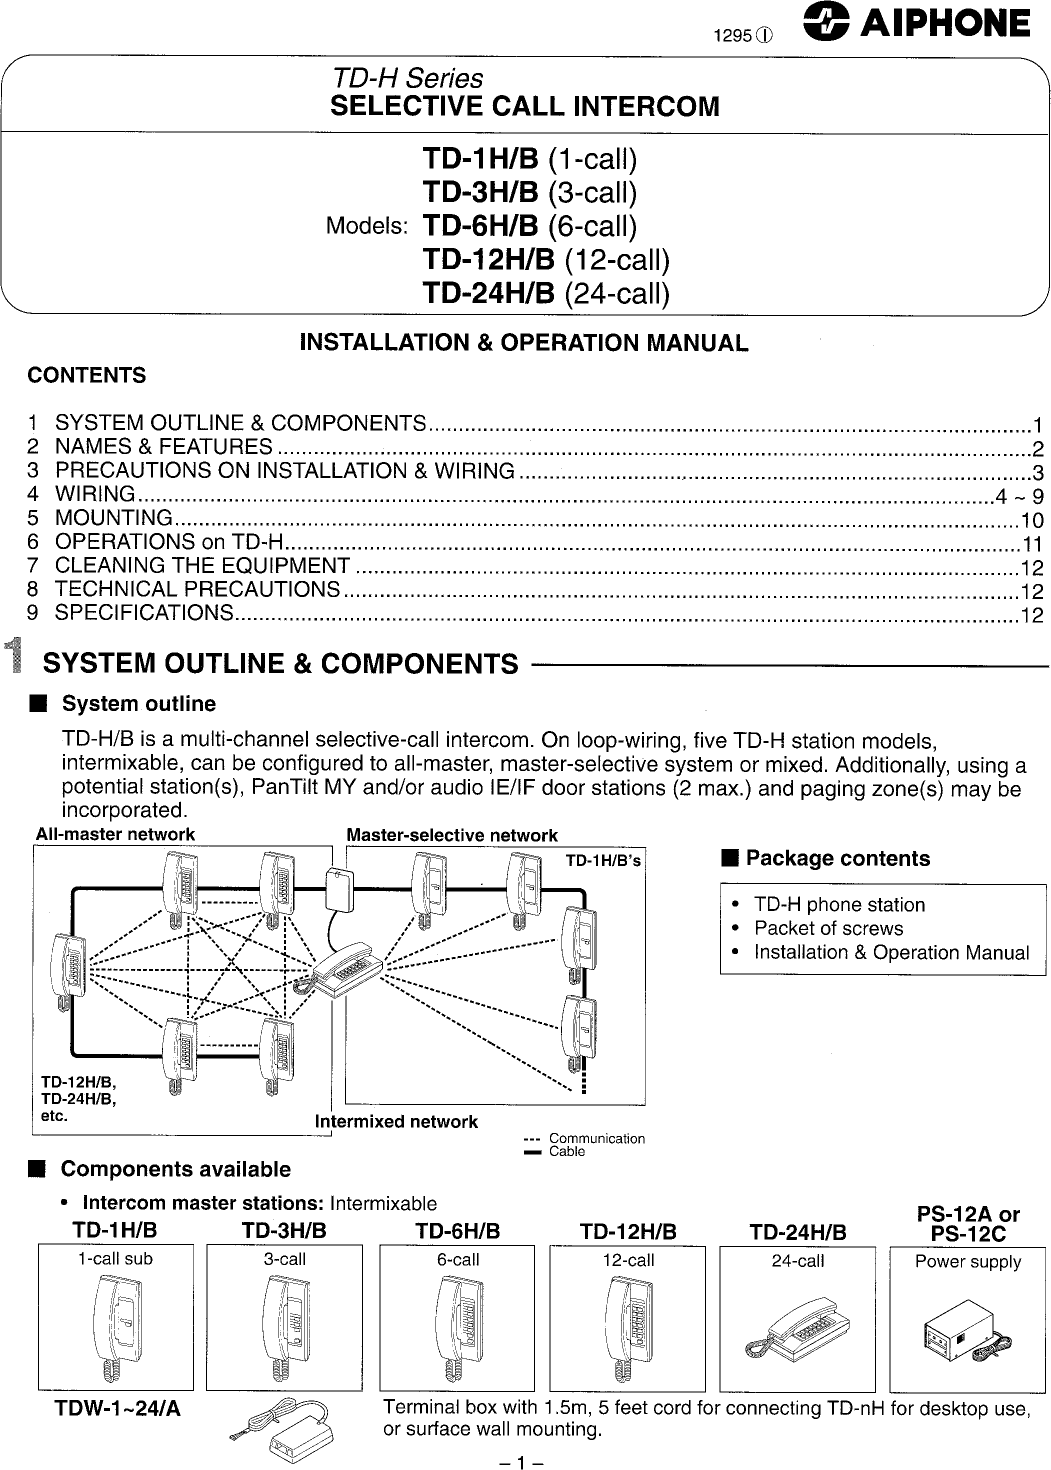 Enjoyable Aiphone Td 12H B Users Manual Wiring Cloud Brecesaoduqqnet